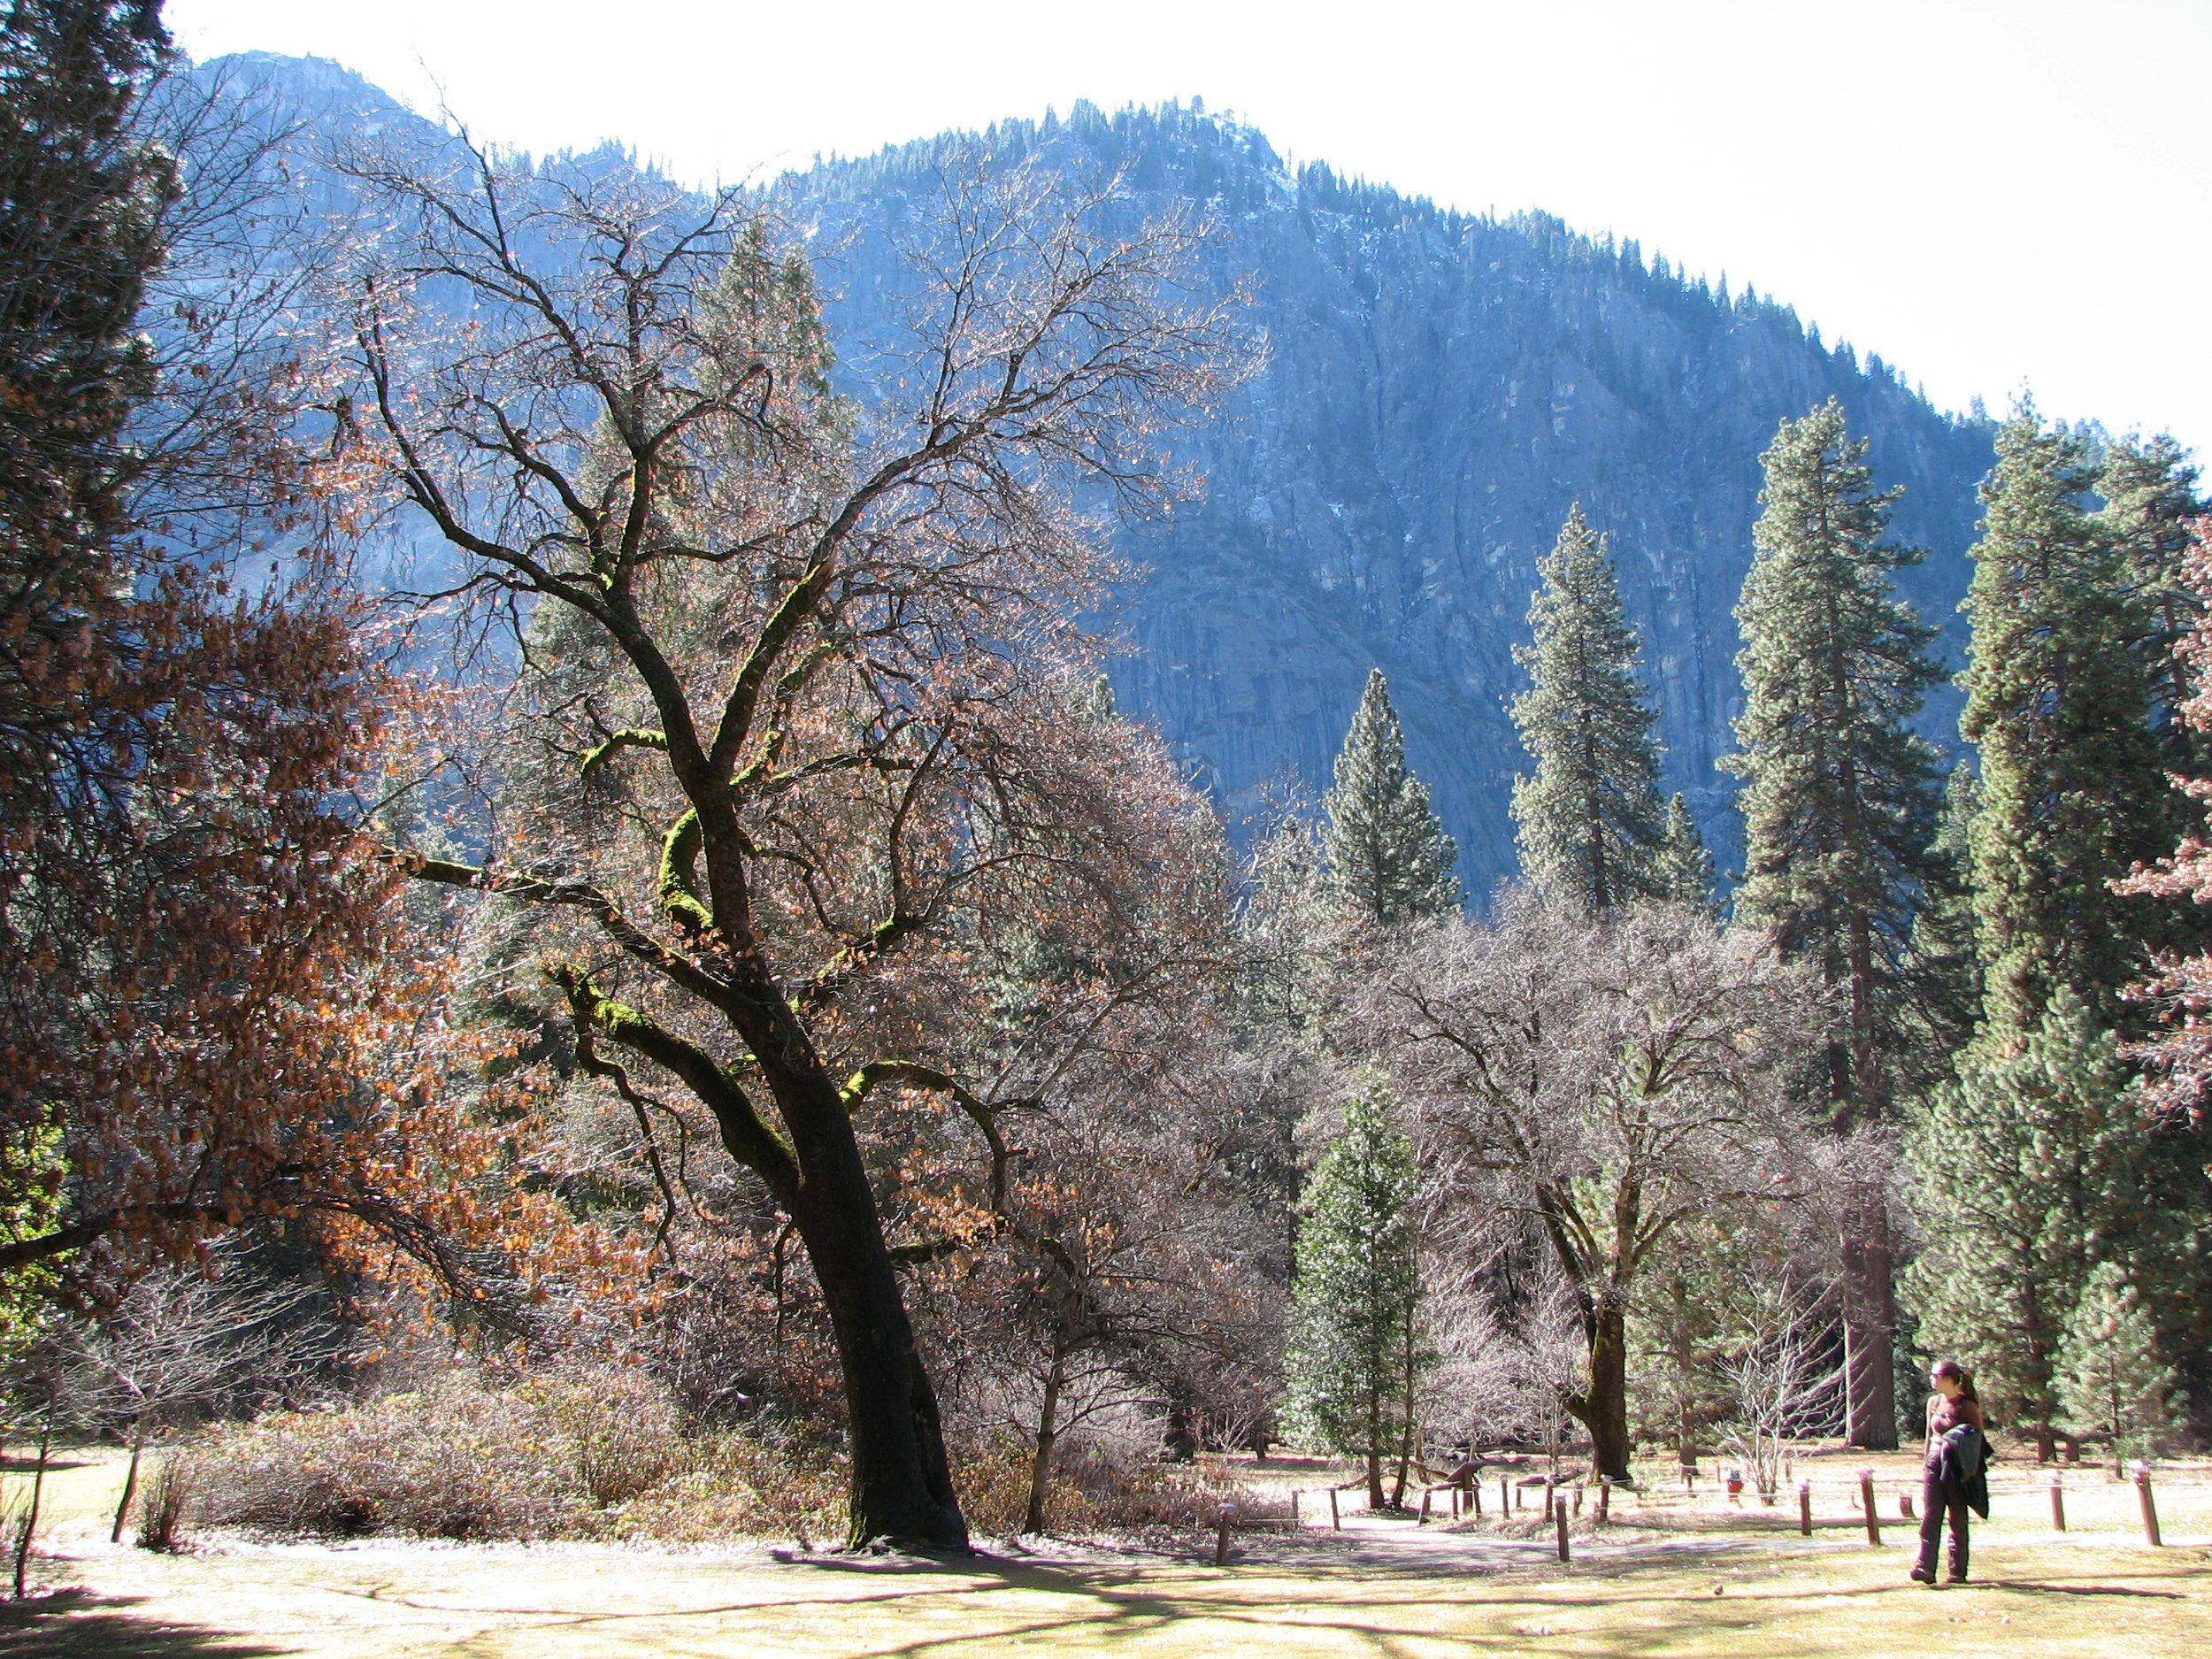 Yosemite_Feb 2007 111